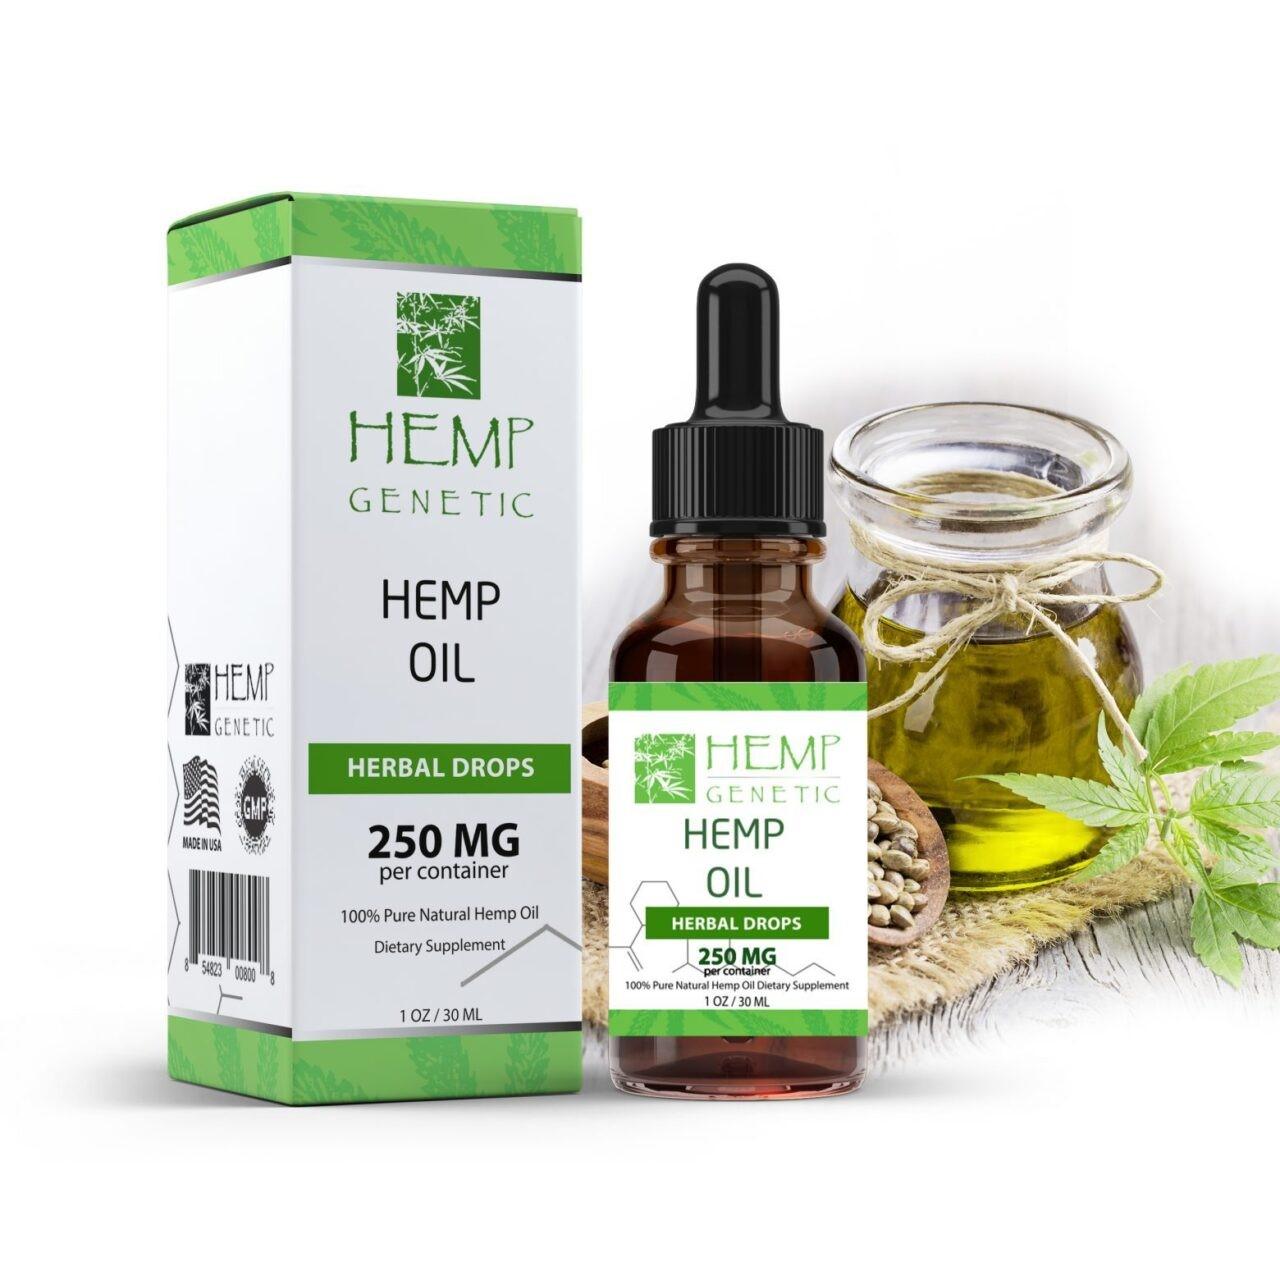 hemp oil boxes